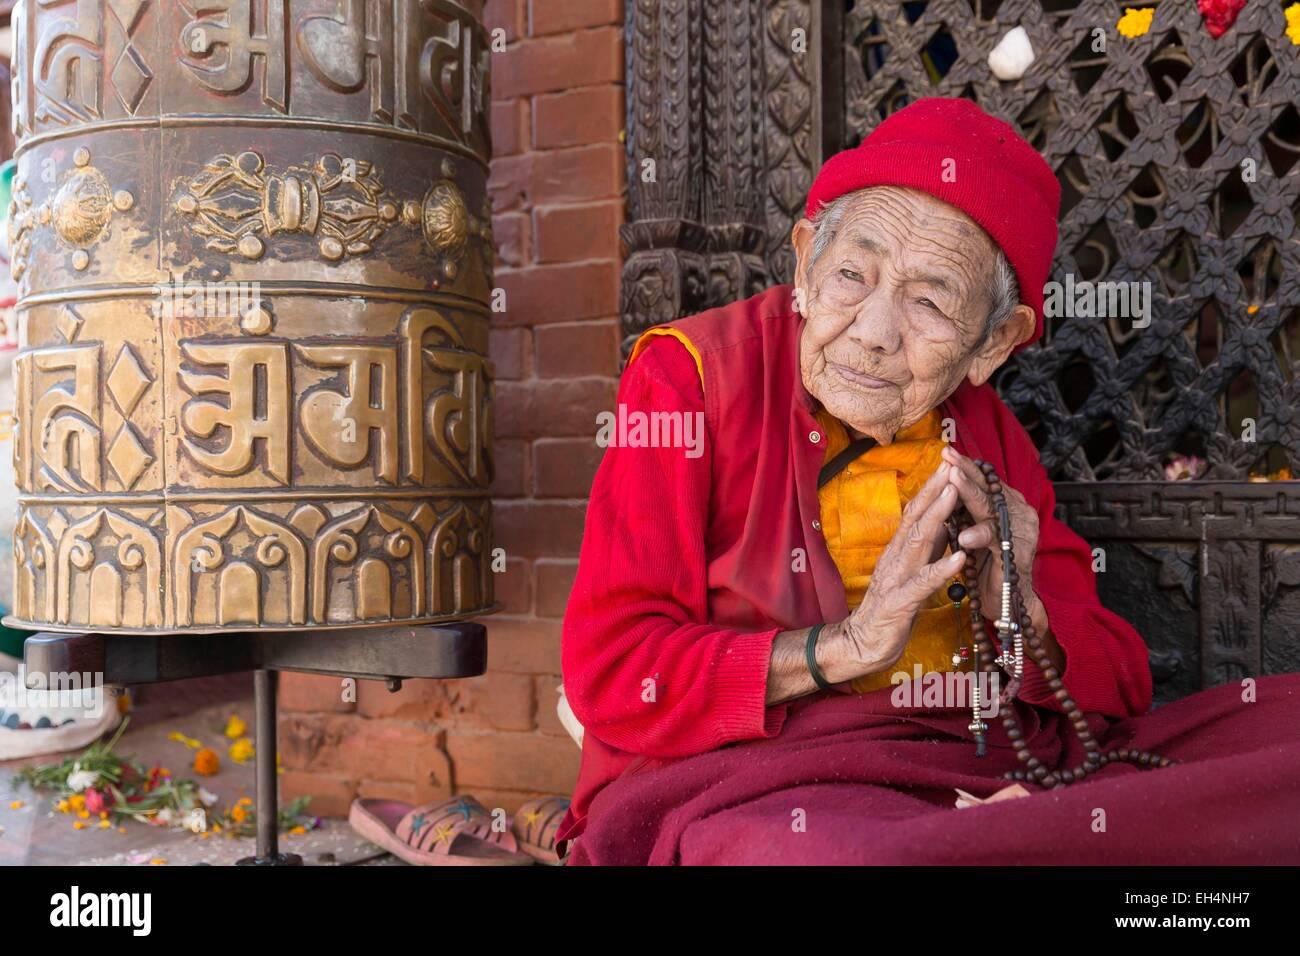 Nepal, Kathmandu, Bodhnath, listed as World Heritage by UNESCO, pilgrim near the Buddhist temple - Stock Image